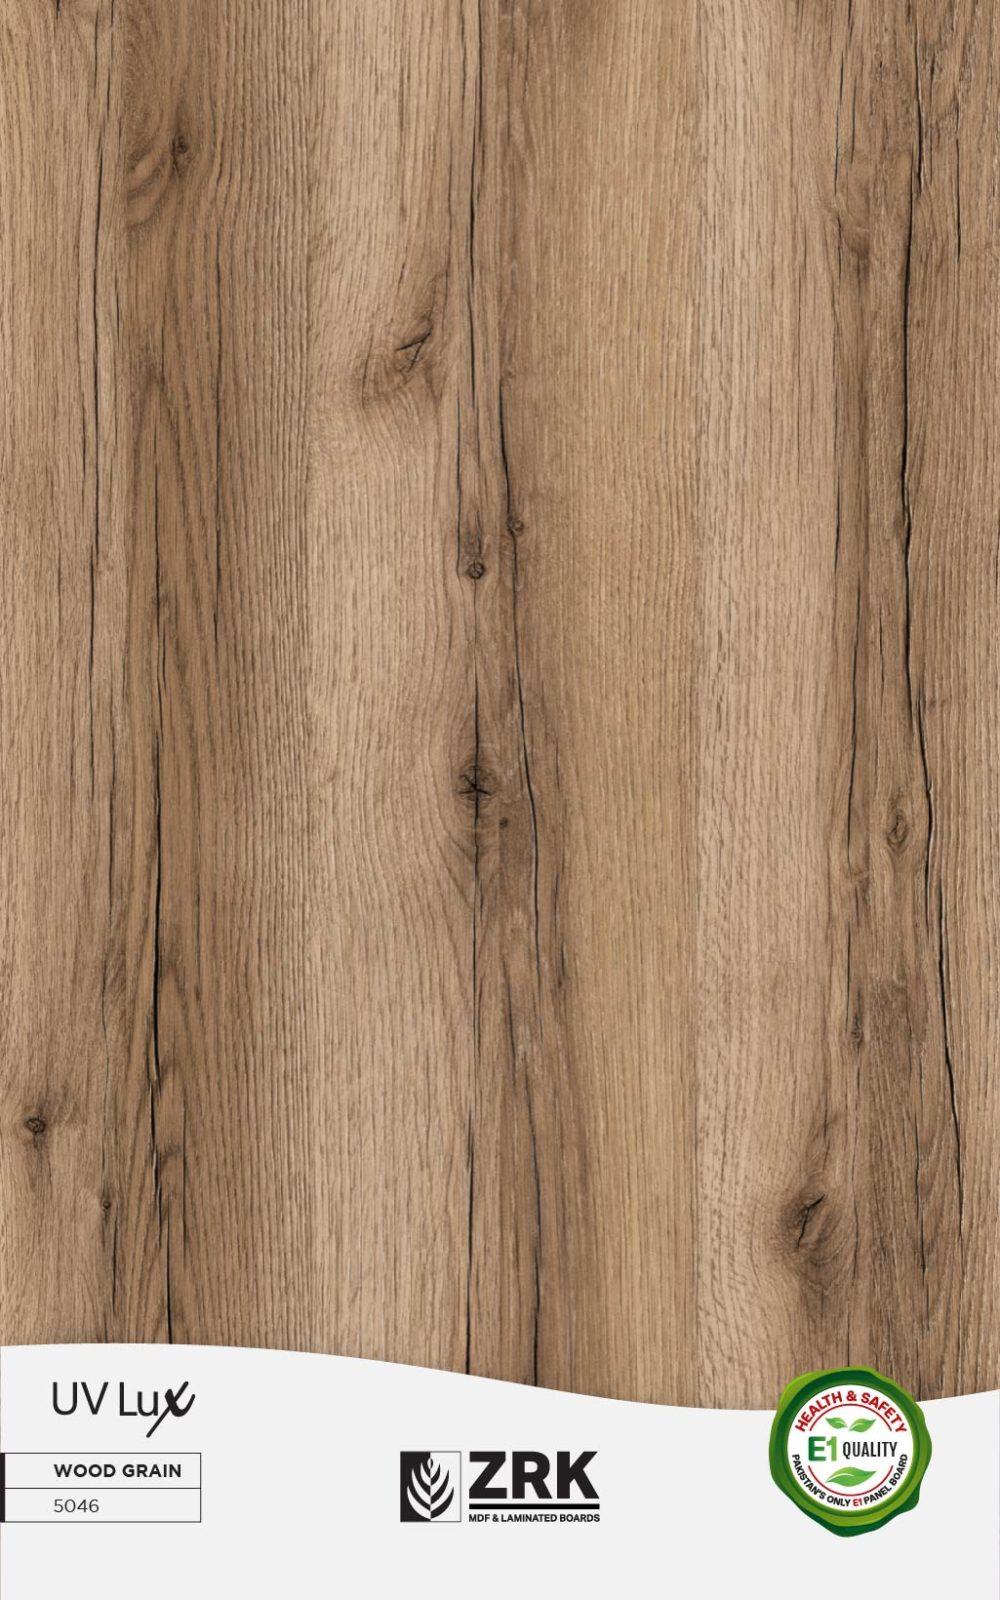 UV LUX - Wood Grain - 5046